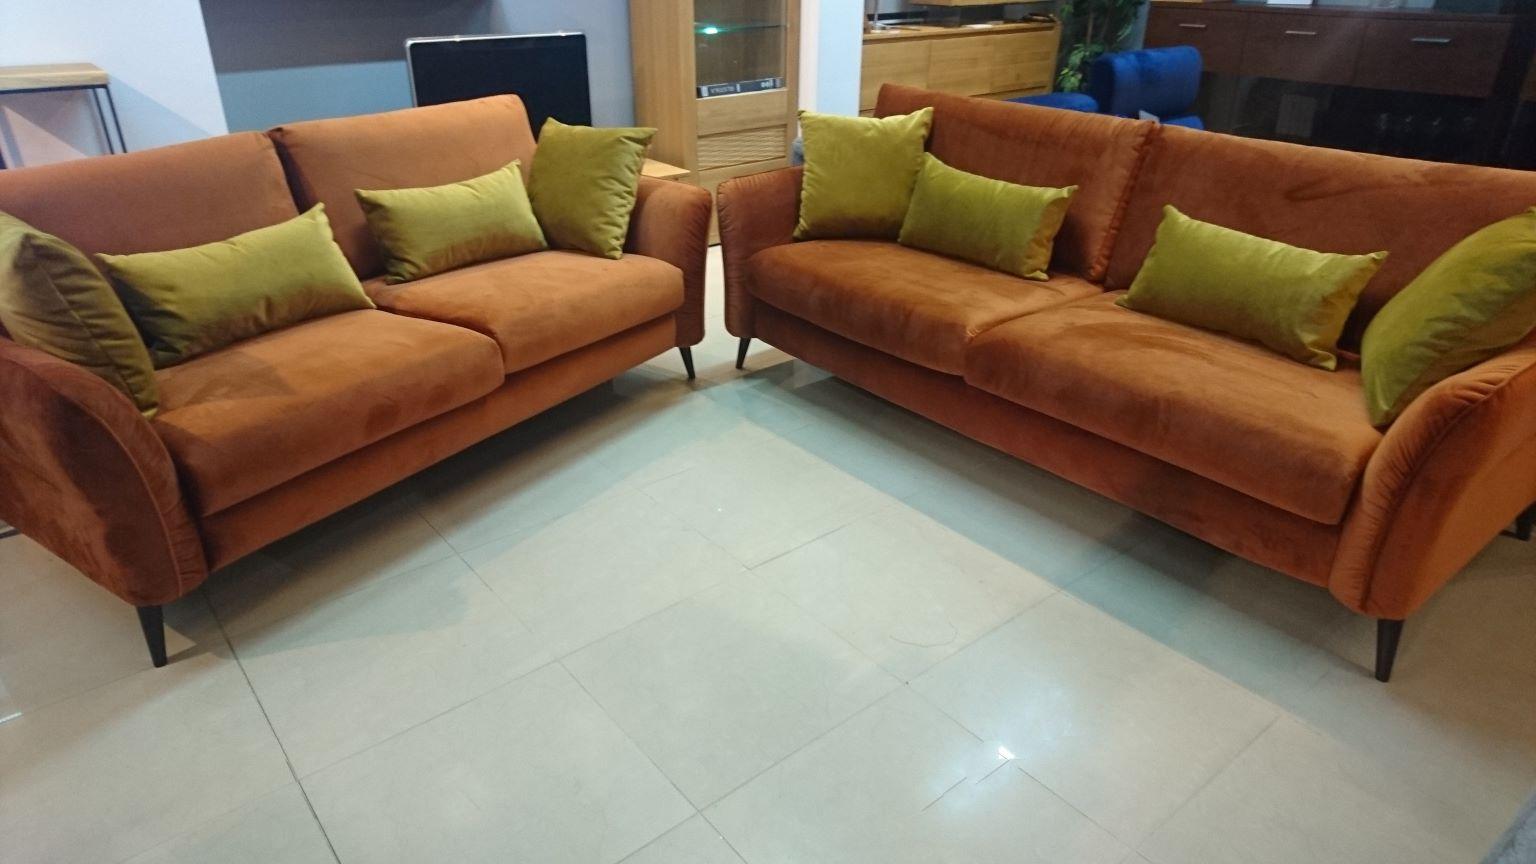 NORTON EMMOHL Warszawa Meble STUDIO KOMFORT sofa 3 i sofa 2,5 tkanina welur orange DOLCE 03